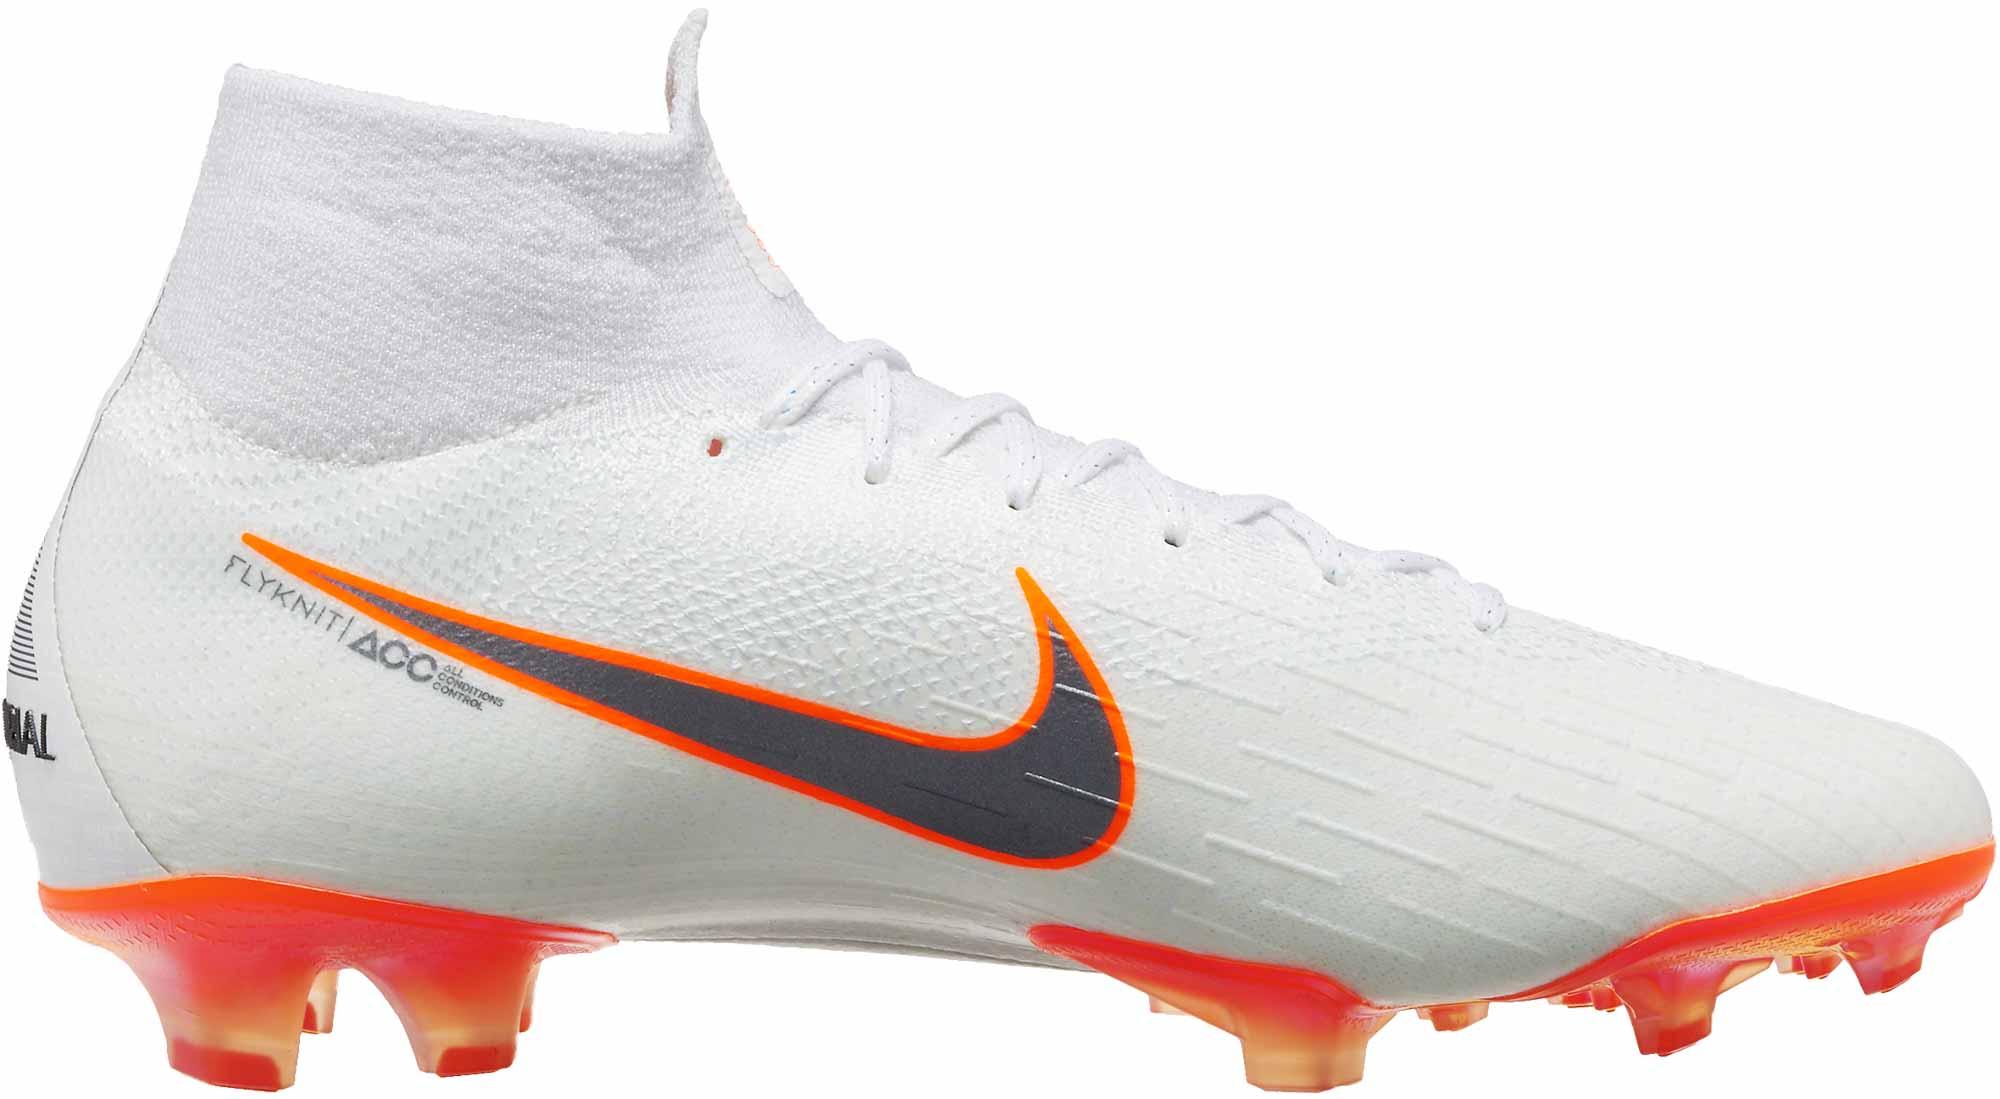 newest collection 4731e d1cc0 Nike Mercurial Superfly 6 Elite FG - White/Total Orange - SoccerPro